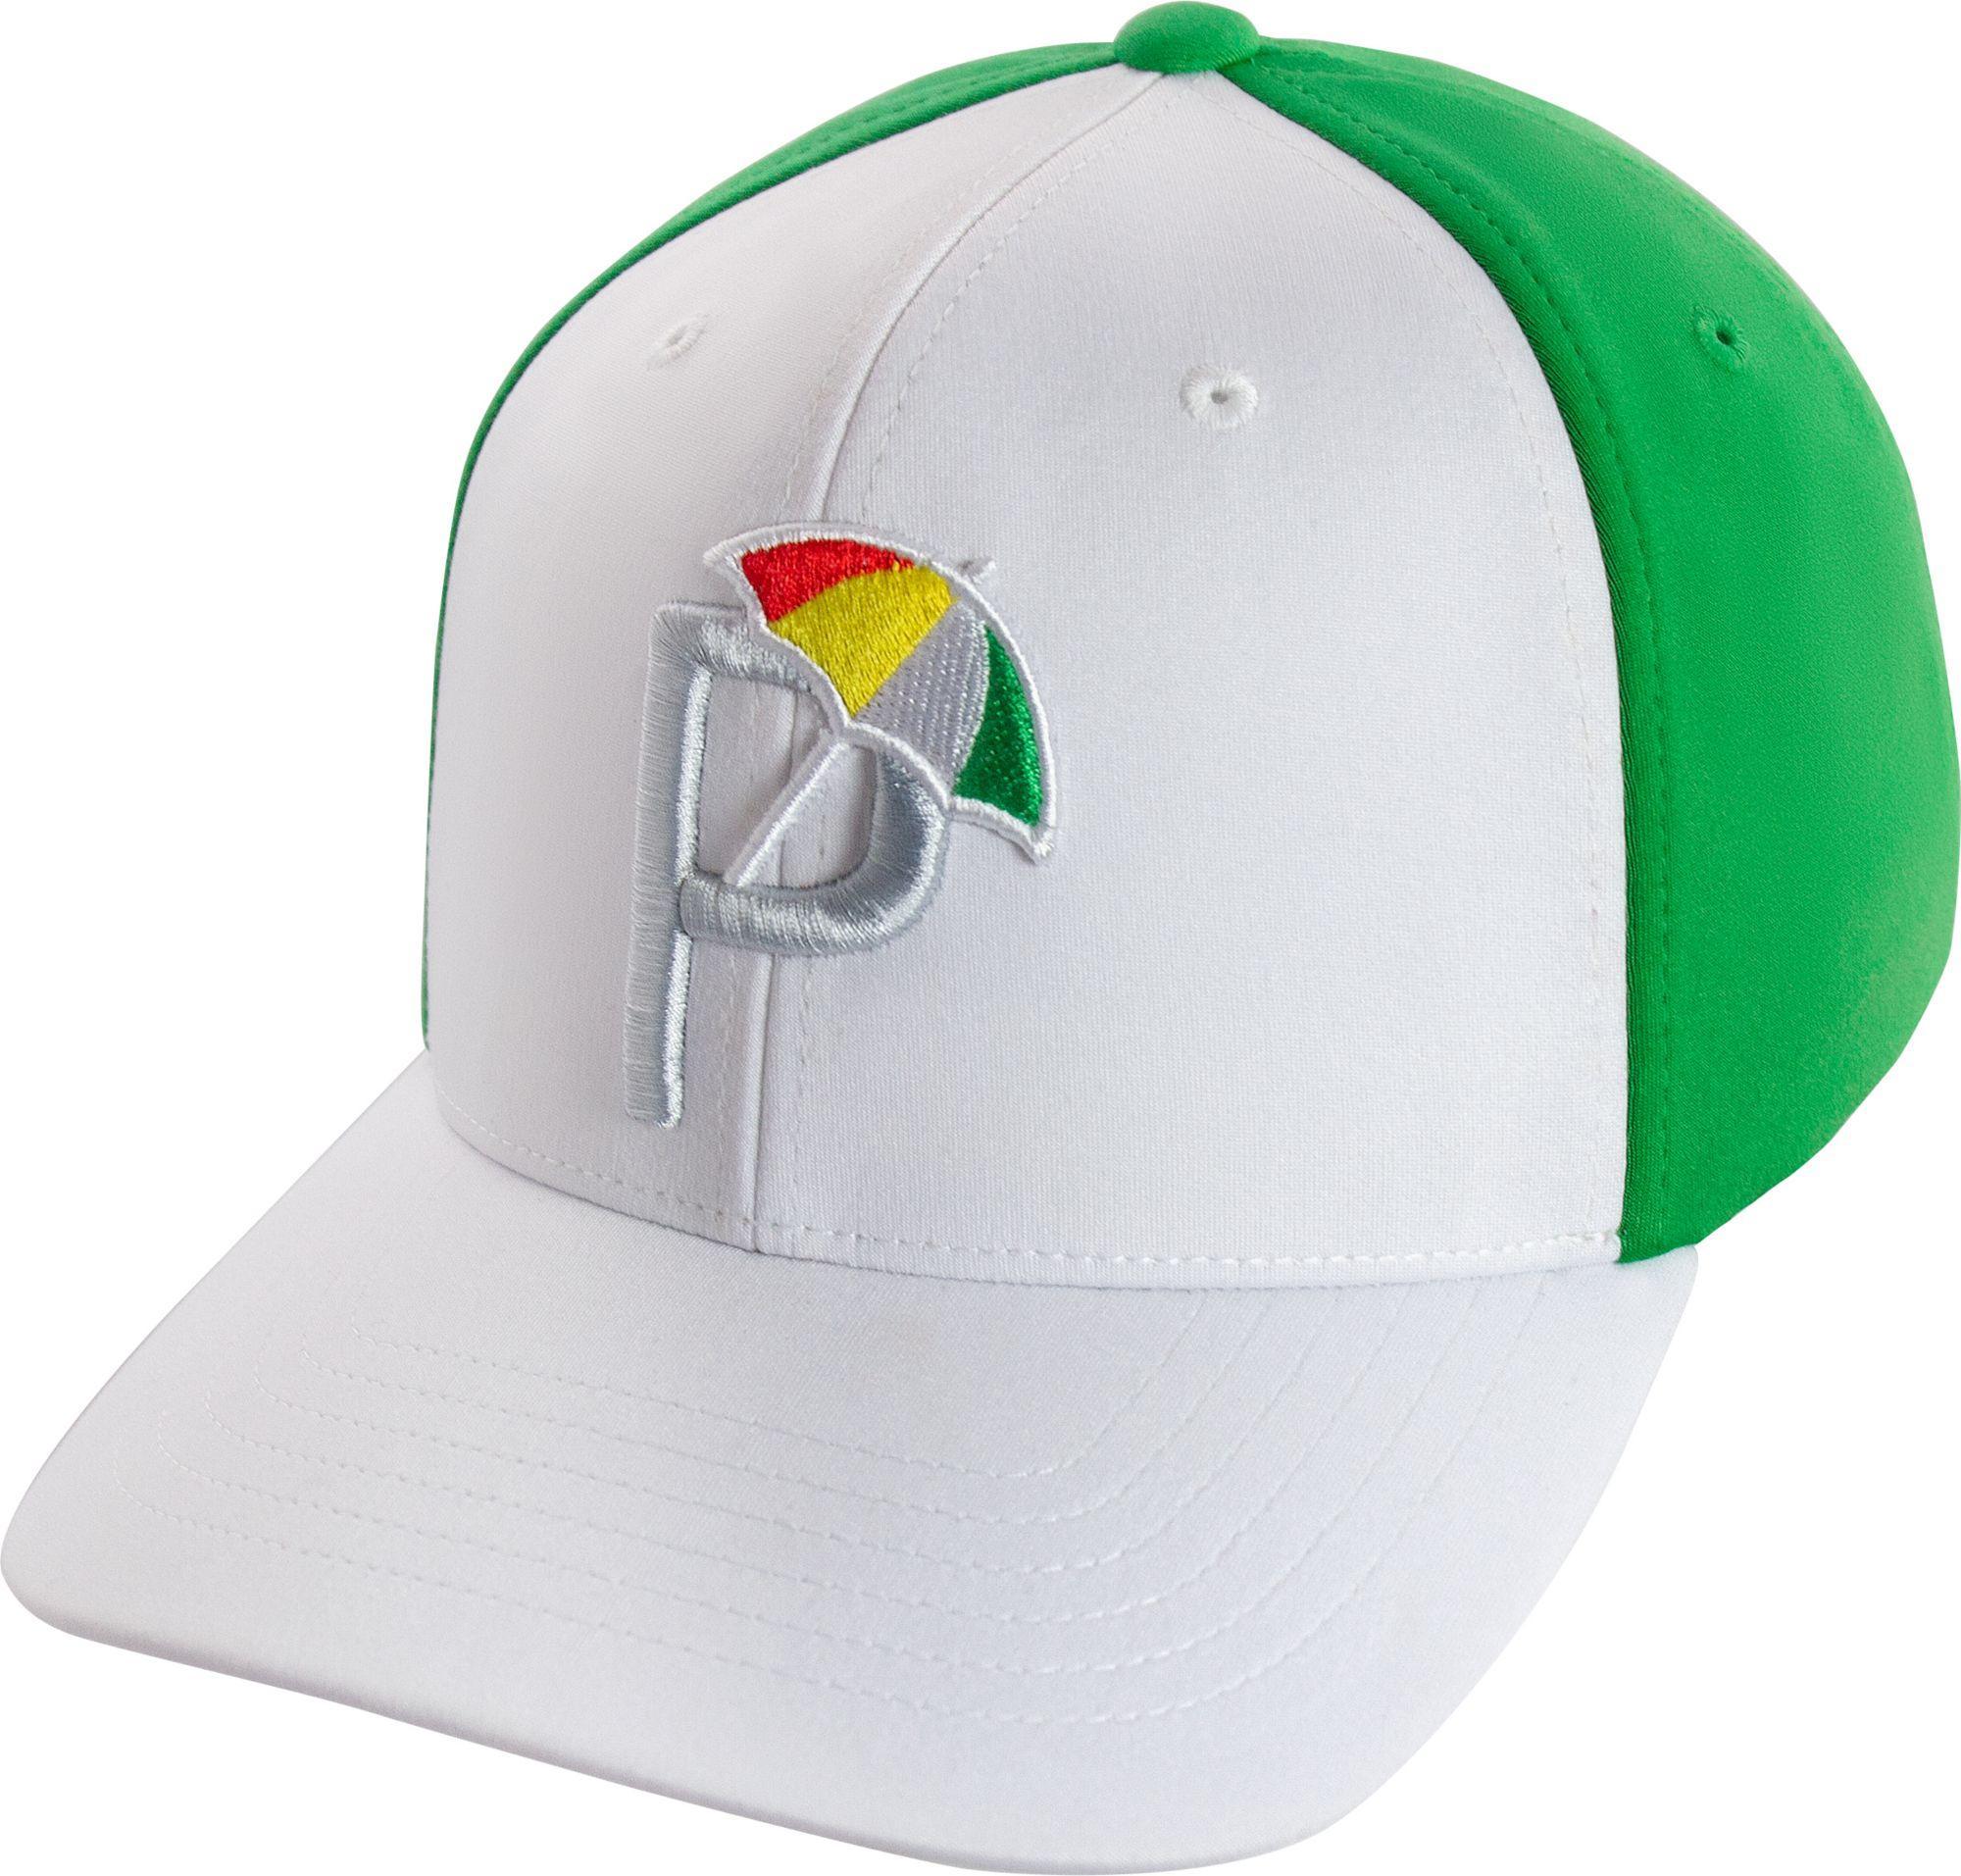 c1685131b PUMA Green Ap Snapback P 110 Golf Hat for men